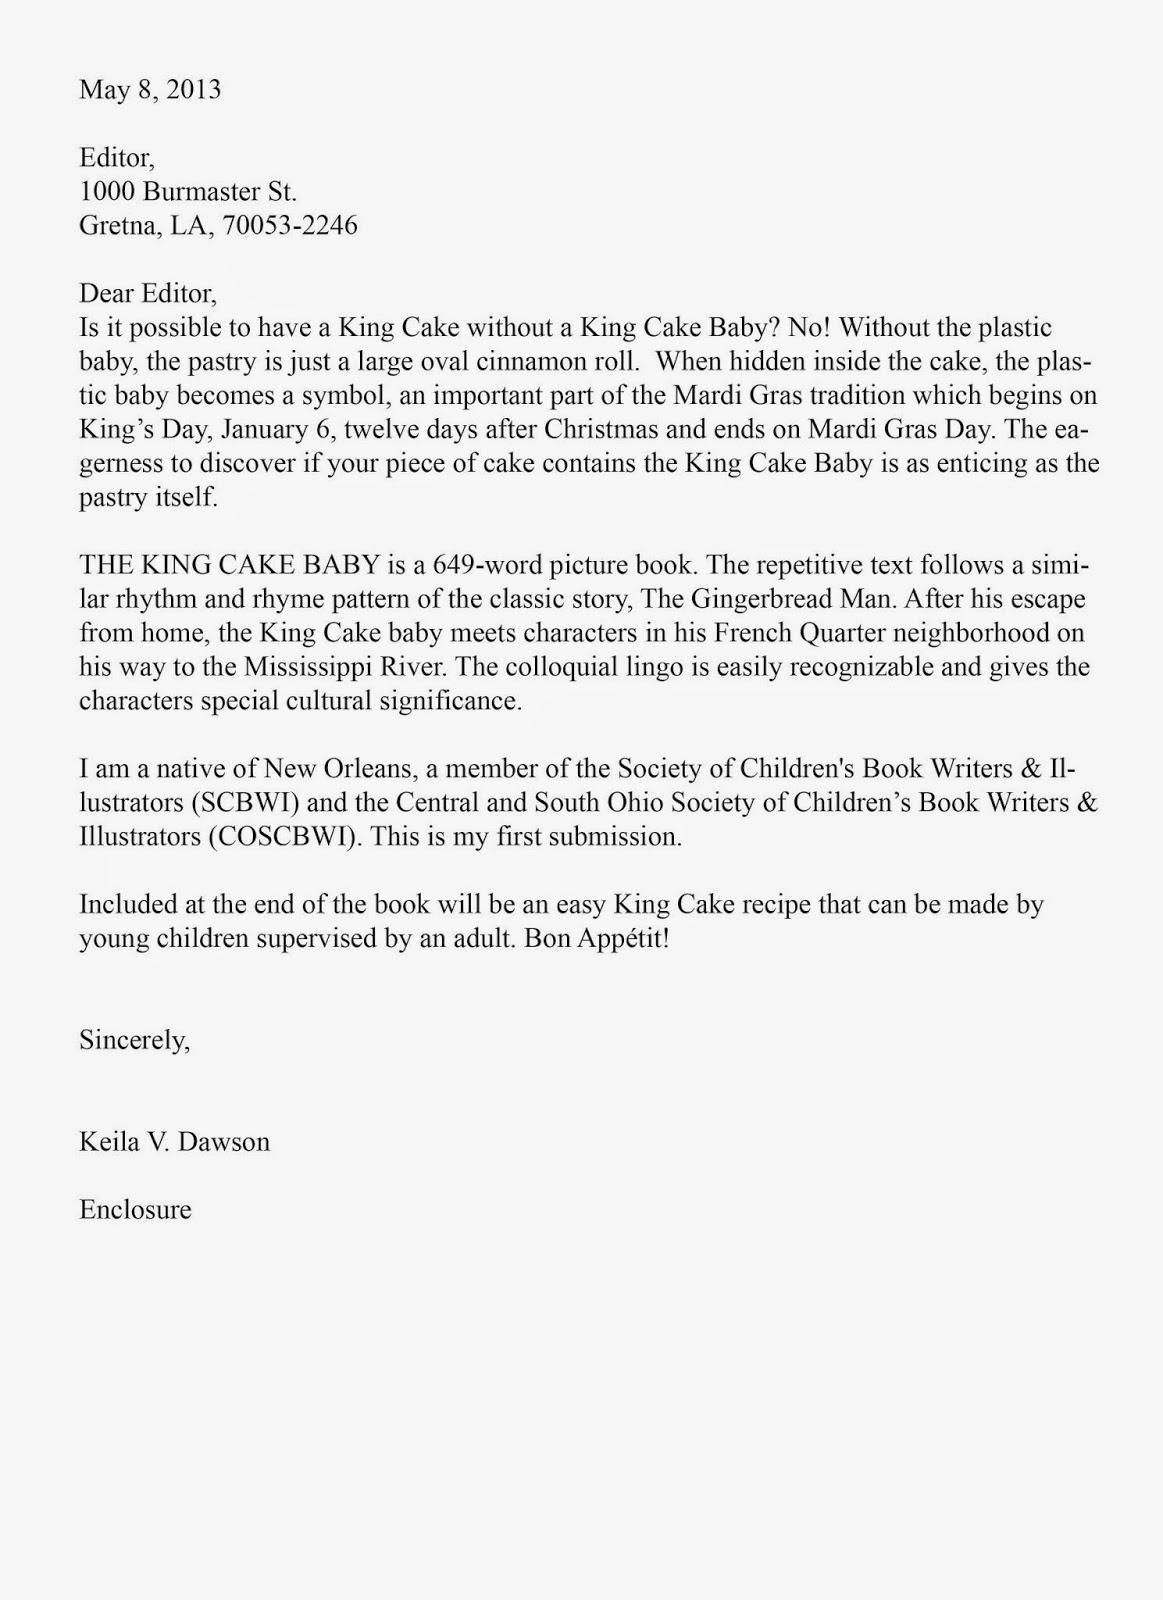 Publishing Editor Cover Letter | Html Editor Cover Letter Sarahepps